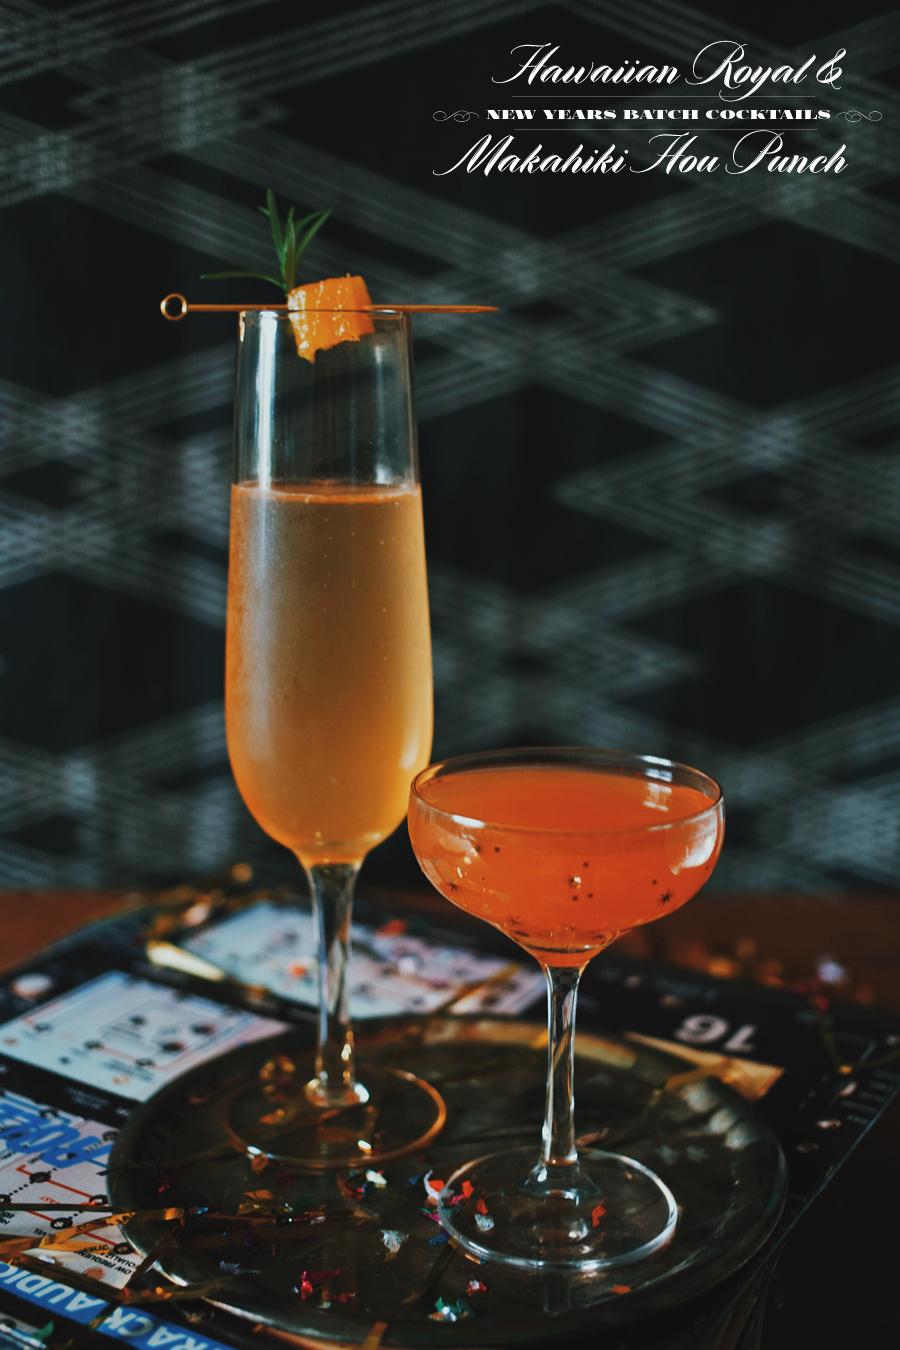 Hawaiian Royal And Makahiki Hou Punch | New Years Cocktails | Dine X Design